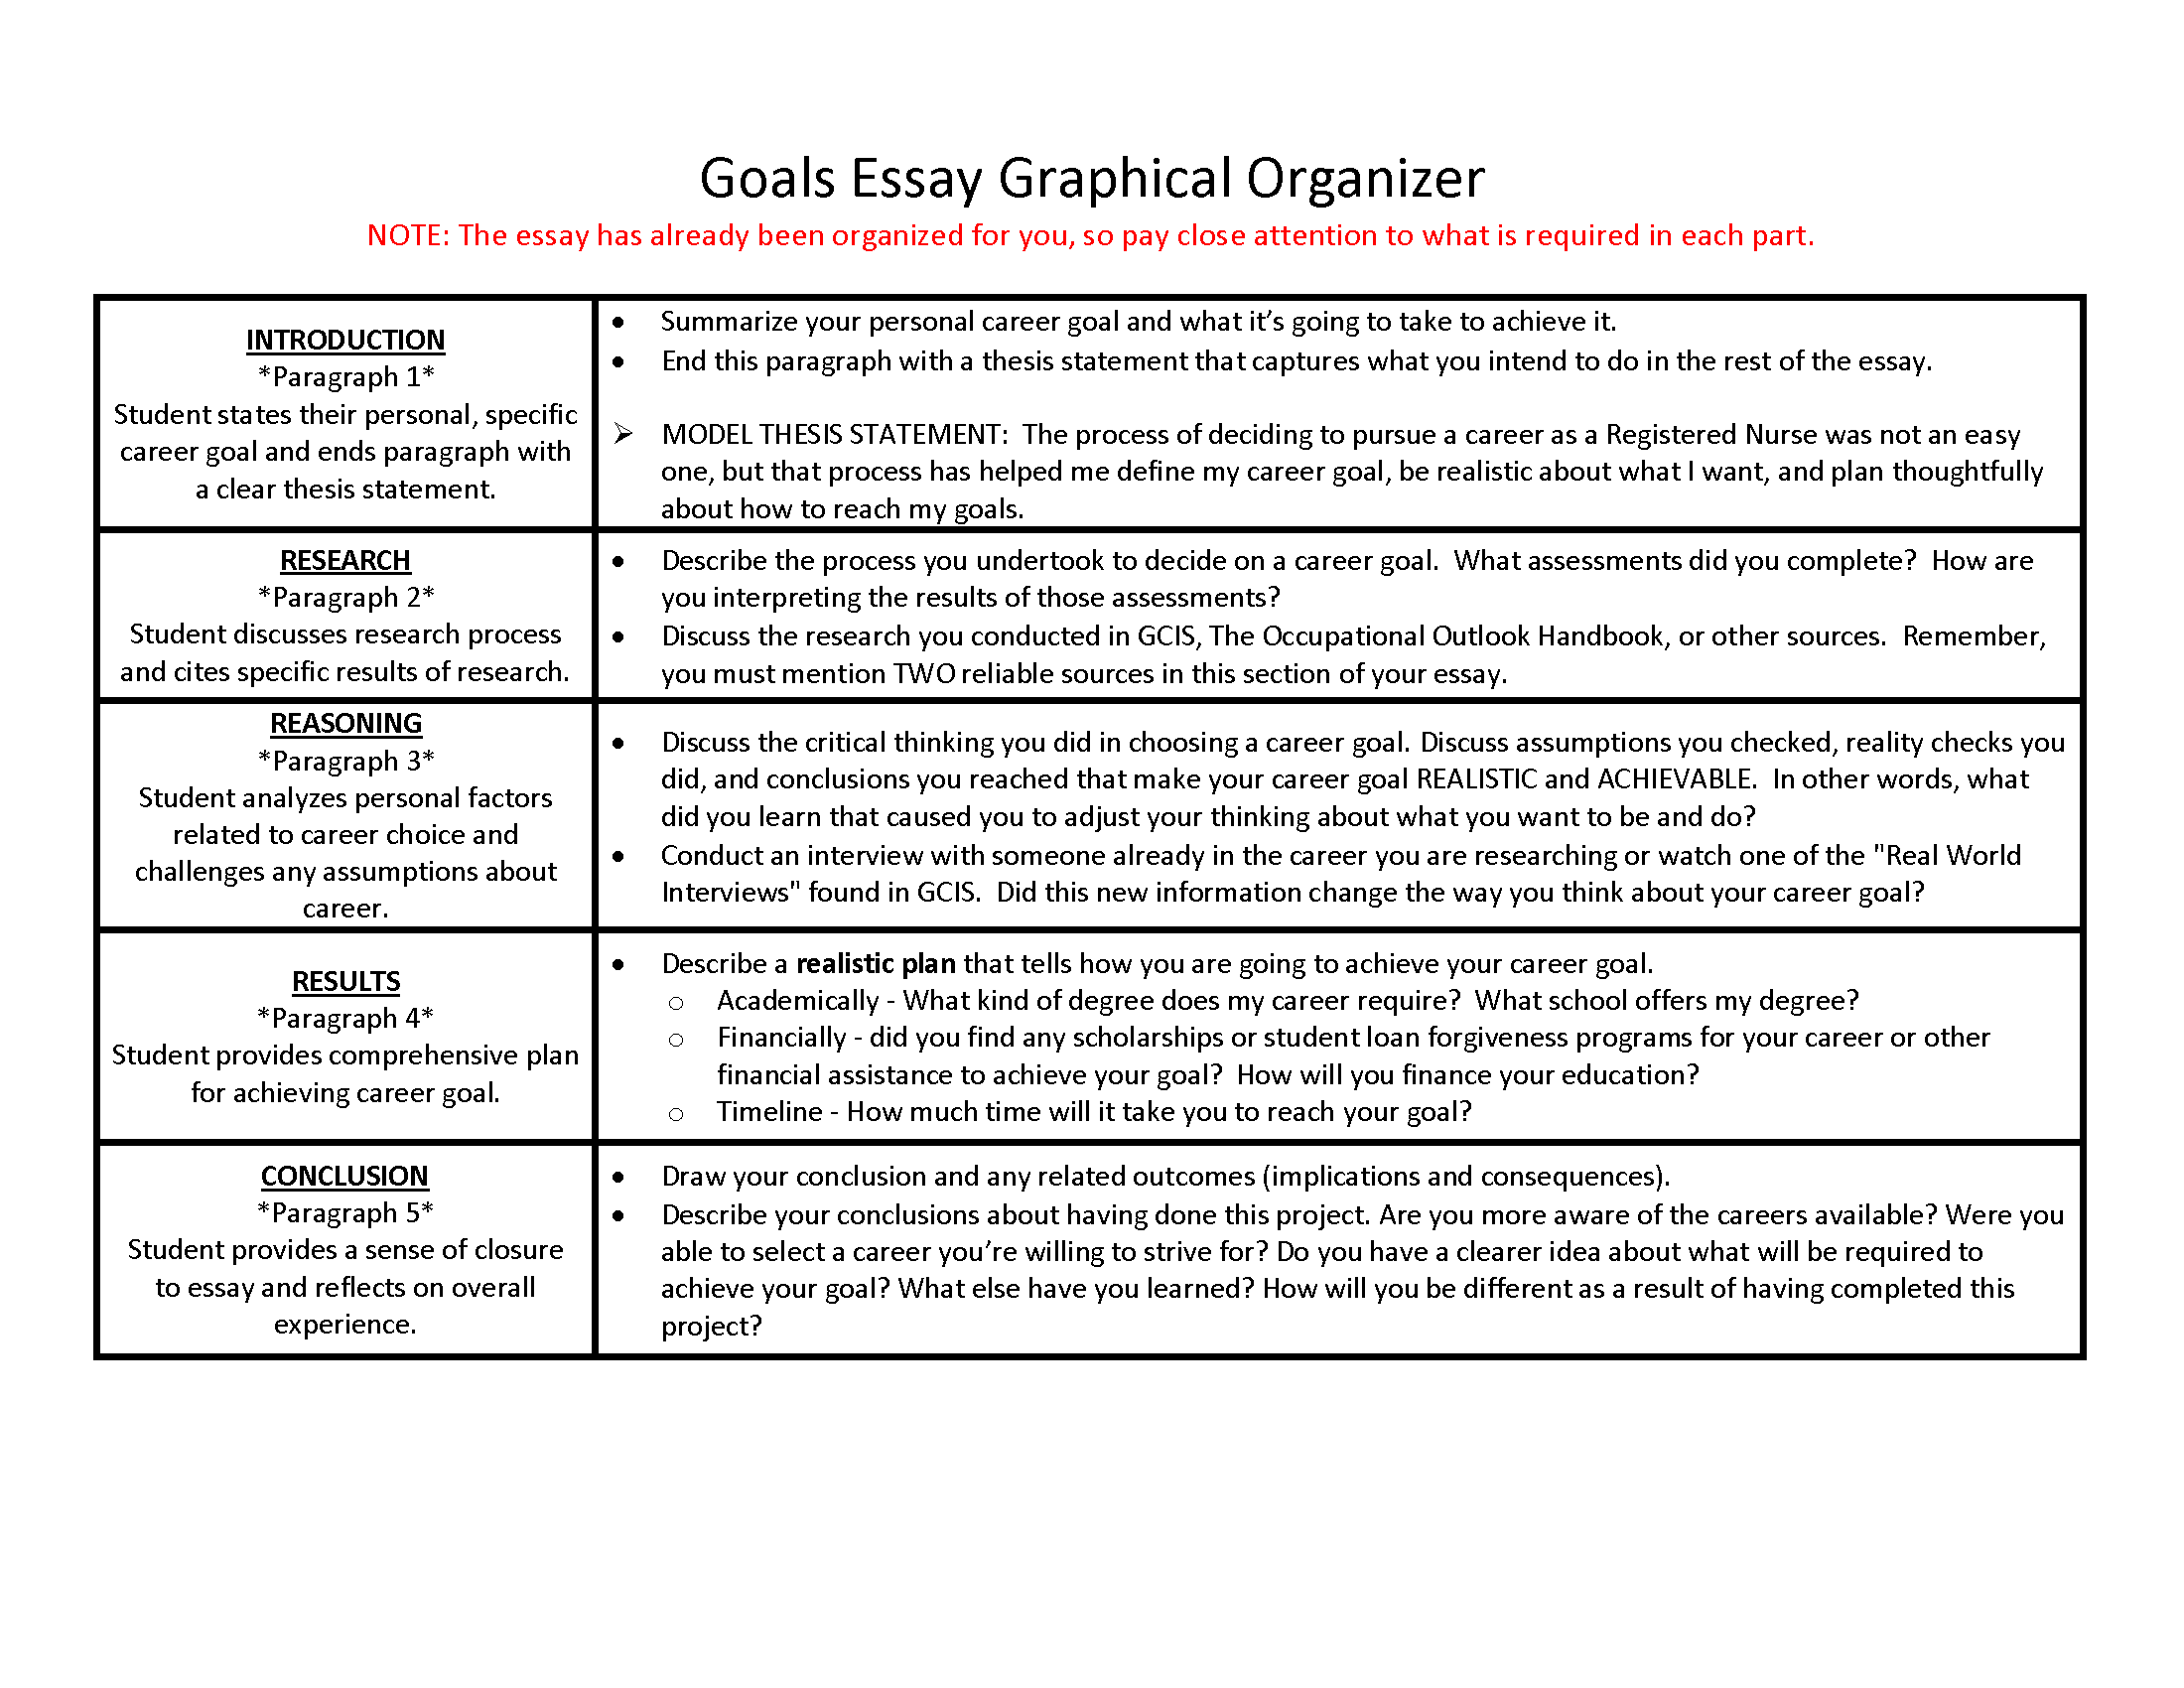 Academic goals essay